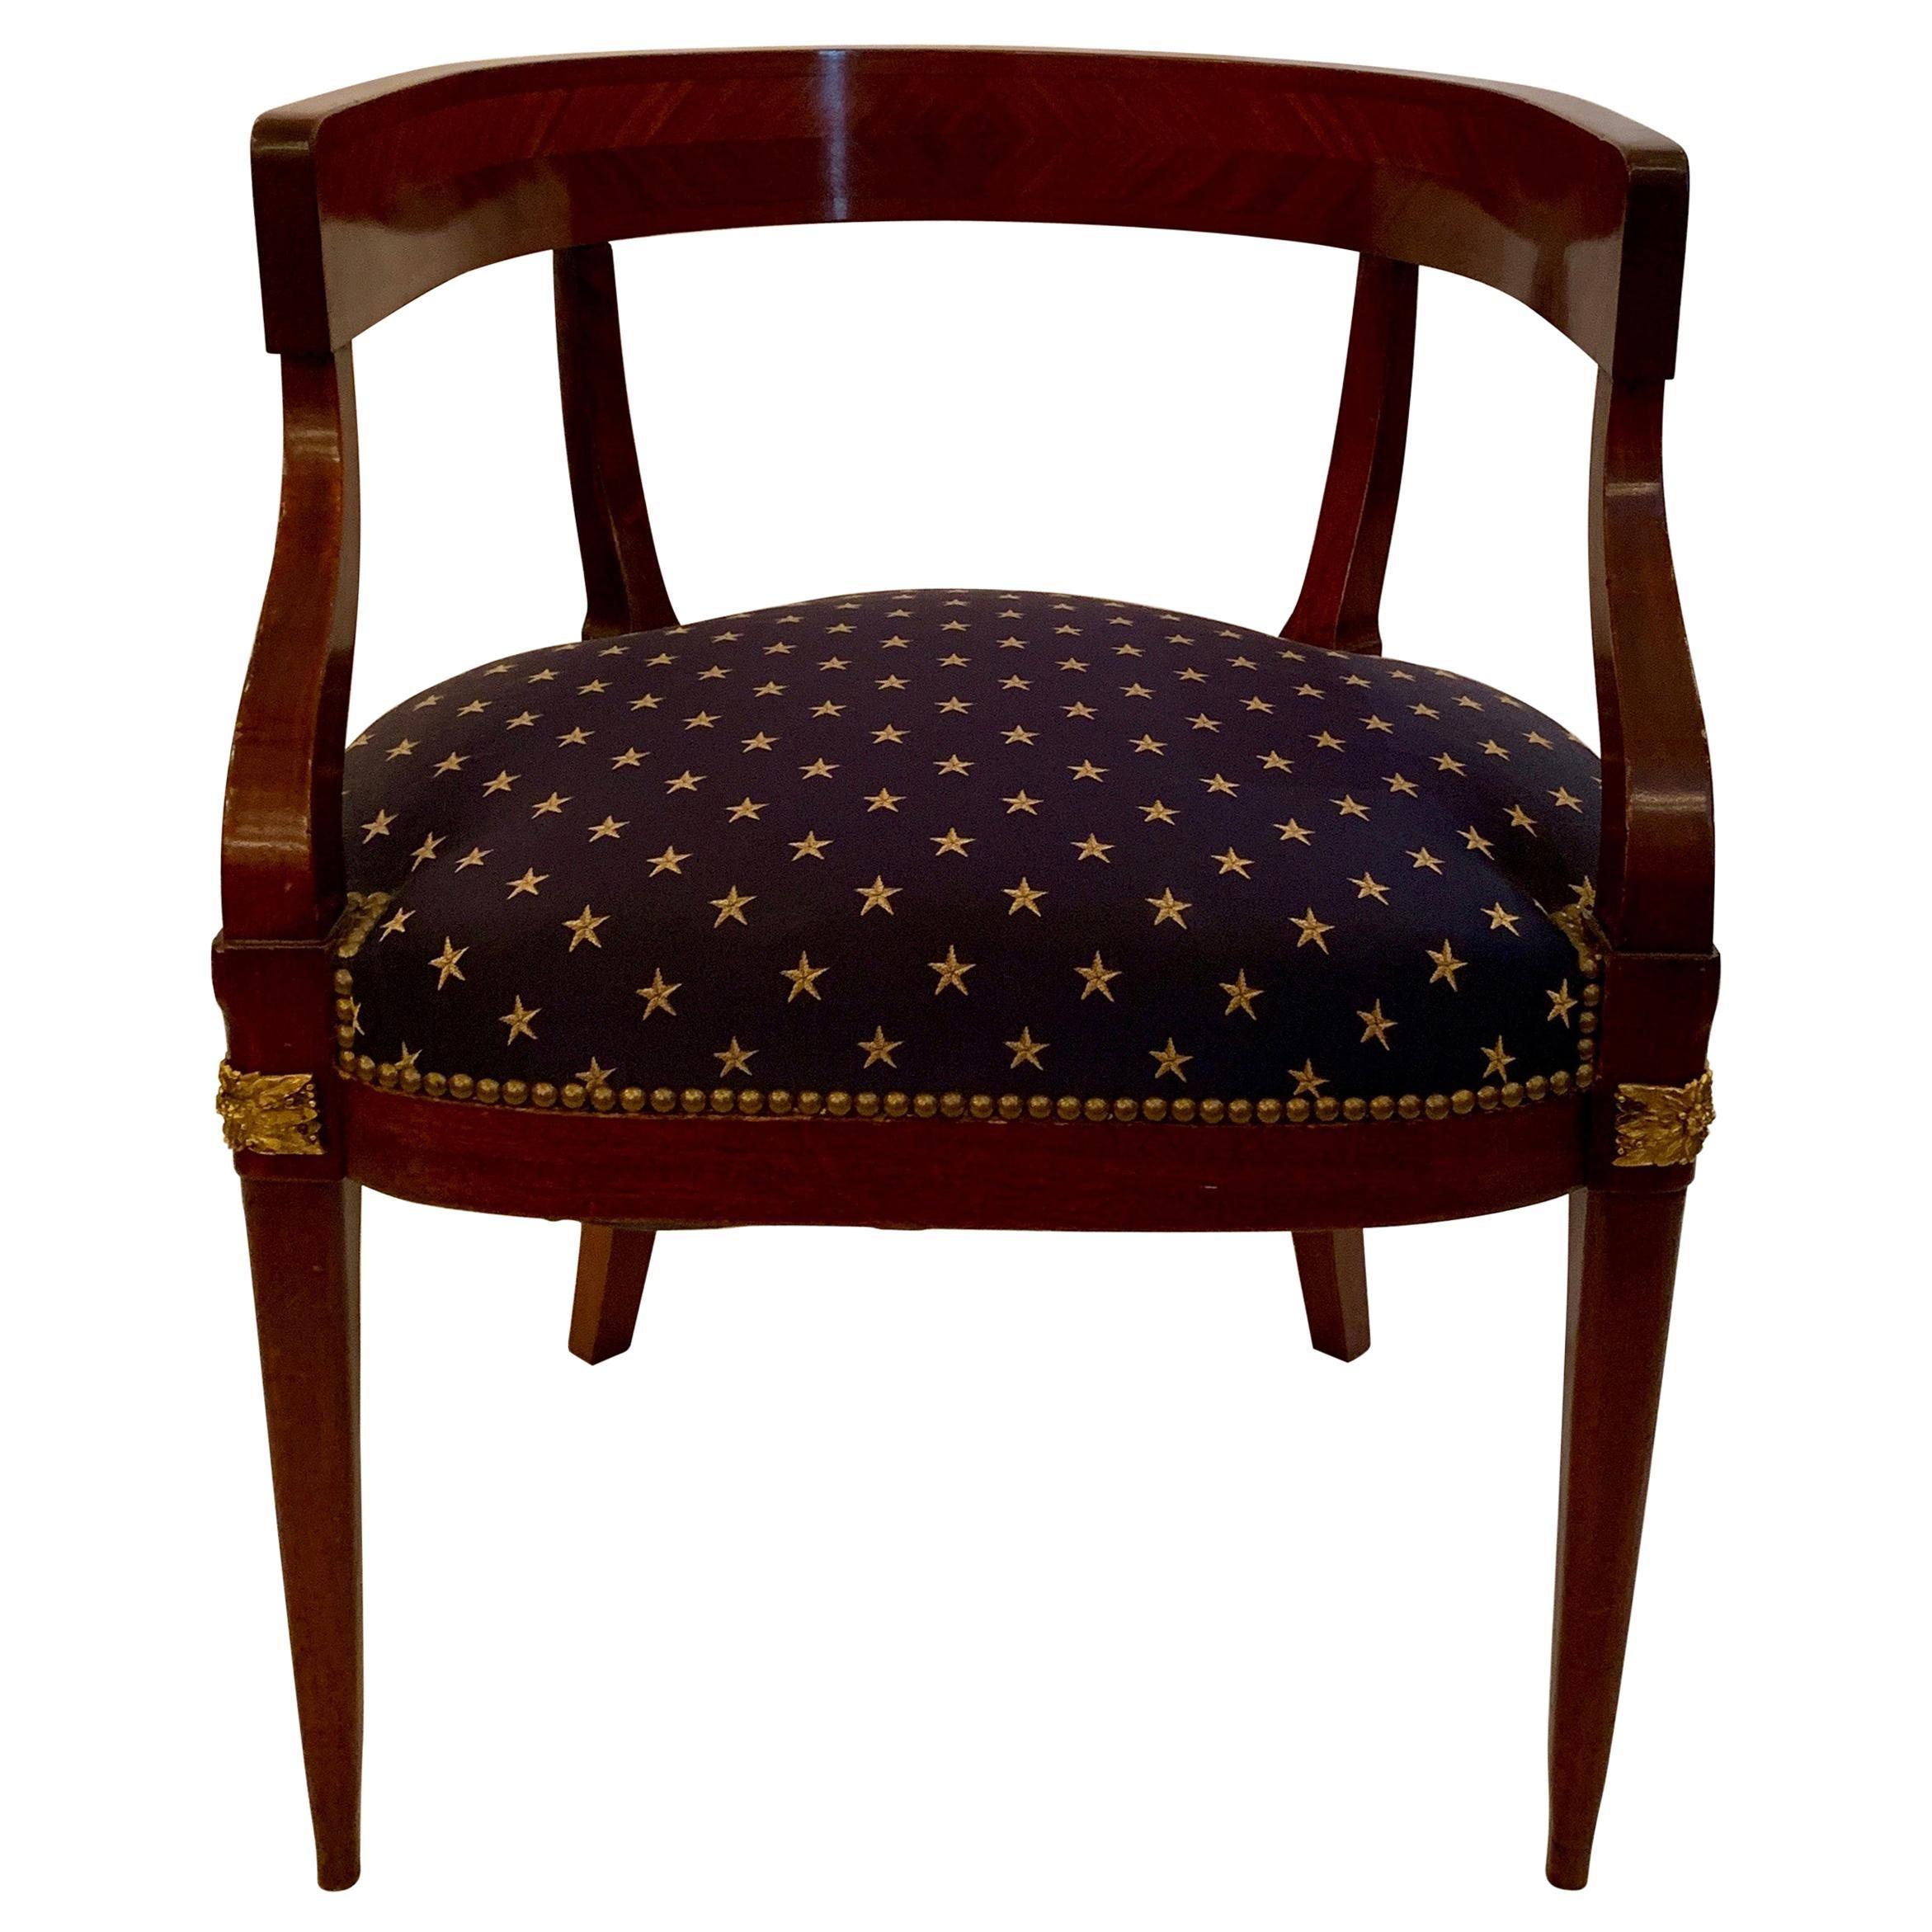 Antique French Mahogany Barrel Back Desk Chair 19th Century